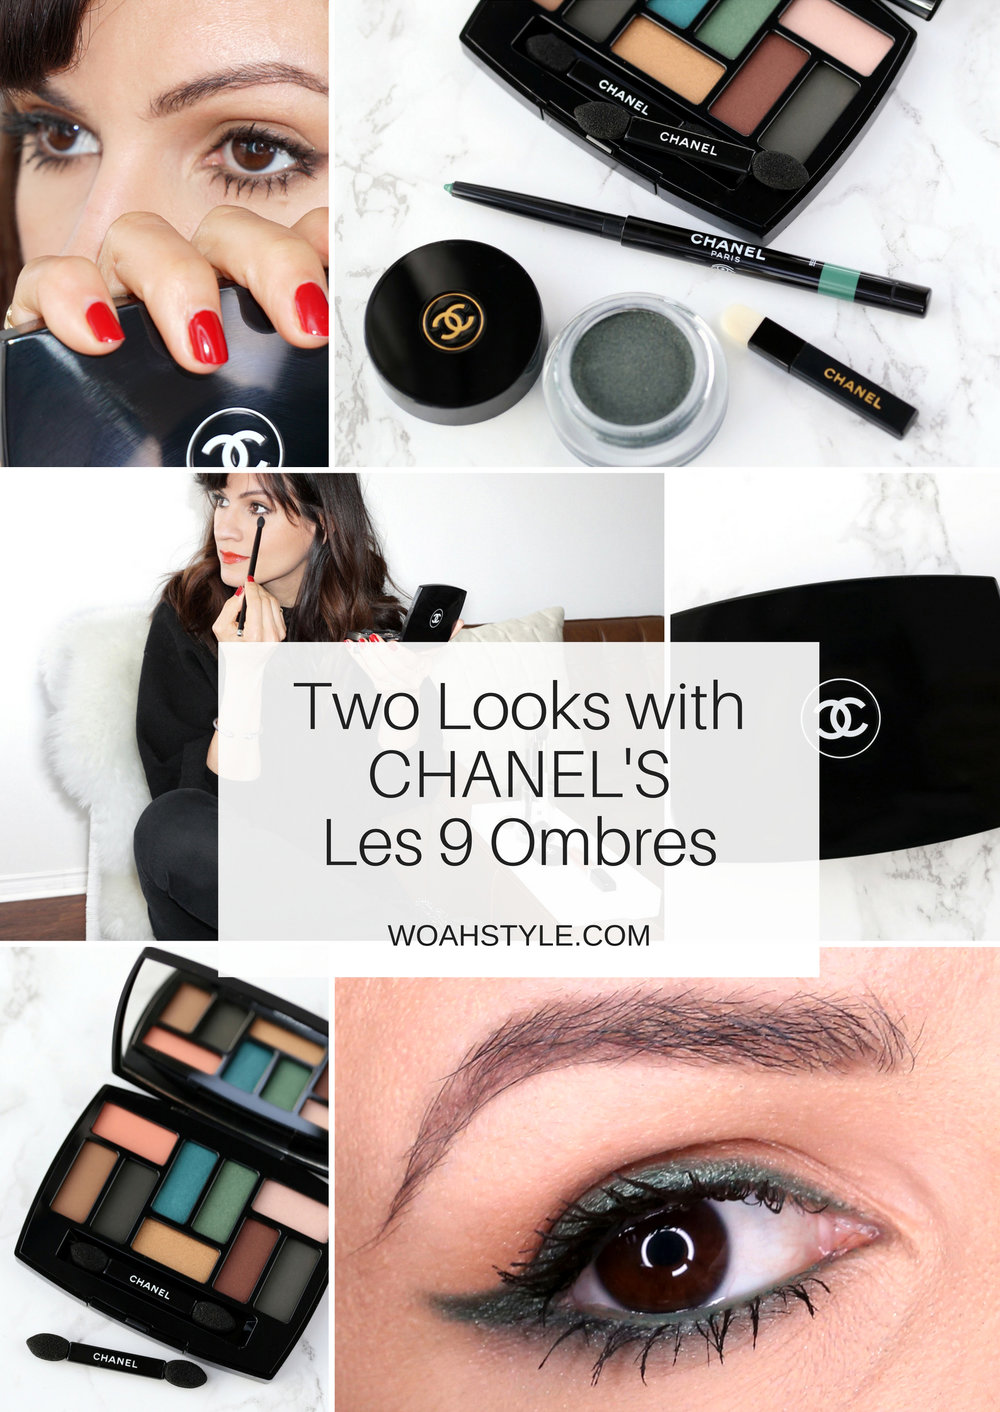 Chanel Les 9 Ombres Affresco eyeshadow palette, Neapolis New City Spring Summer 2018, woahstyle.com - nathalie martin.jpg